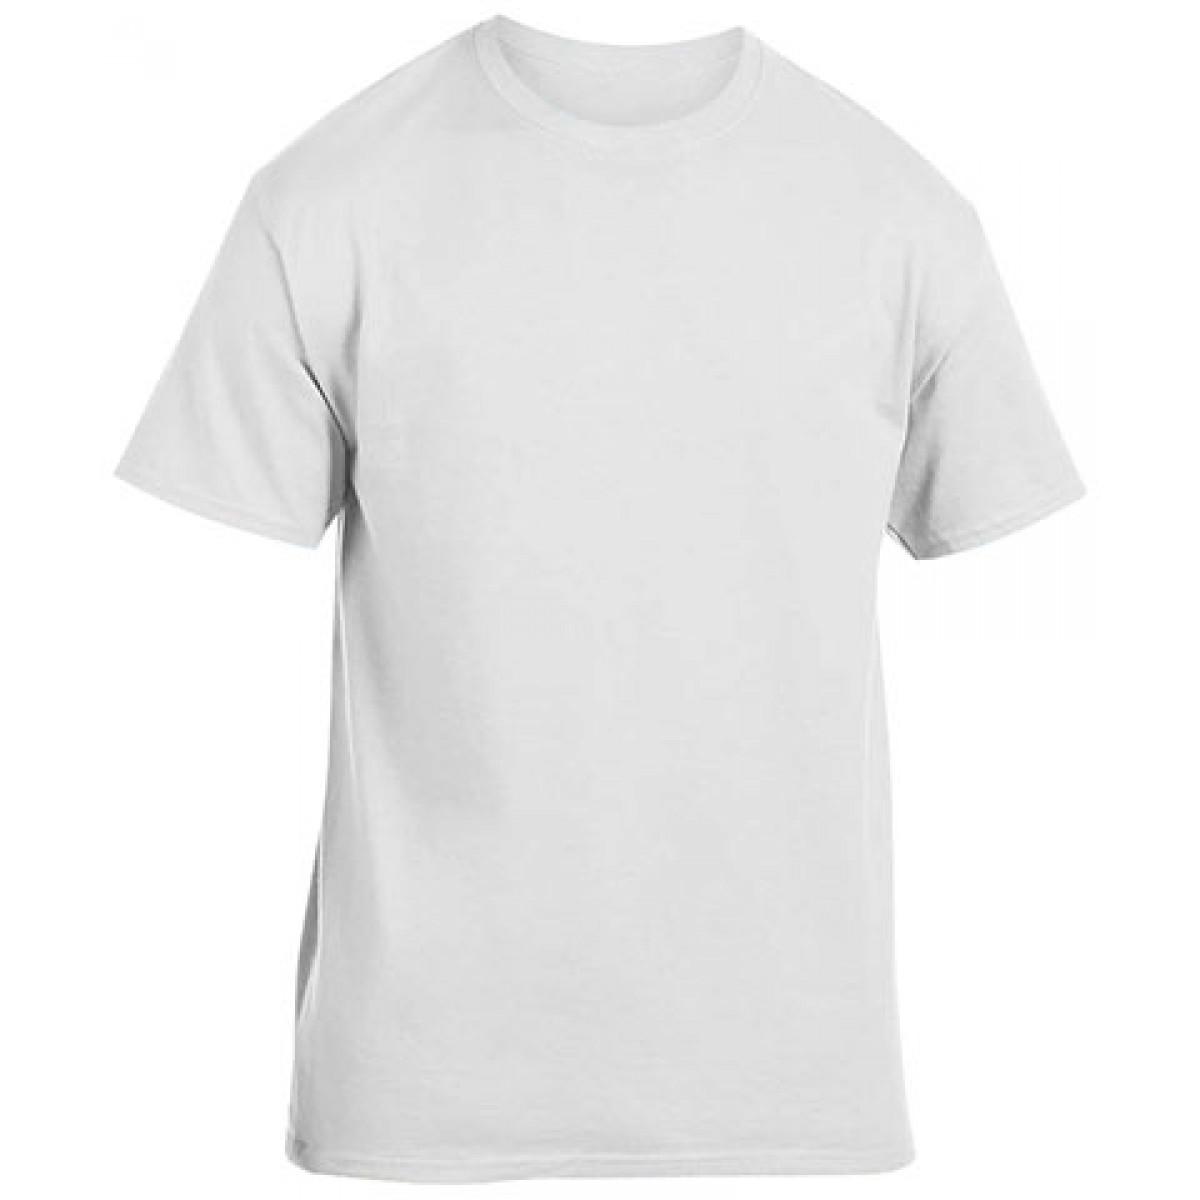 Cotton Short Sleeve T-Shirt-White-XL